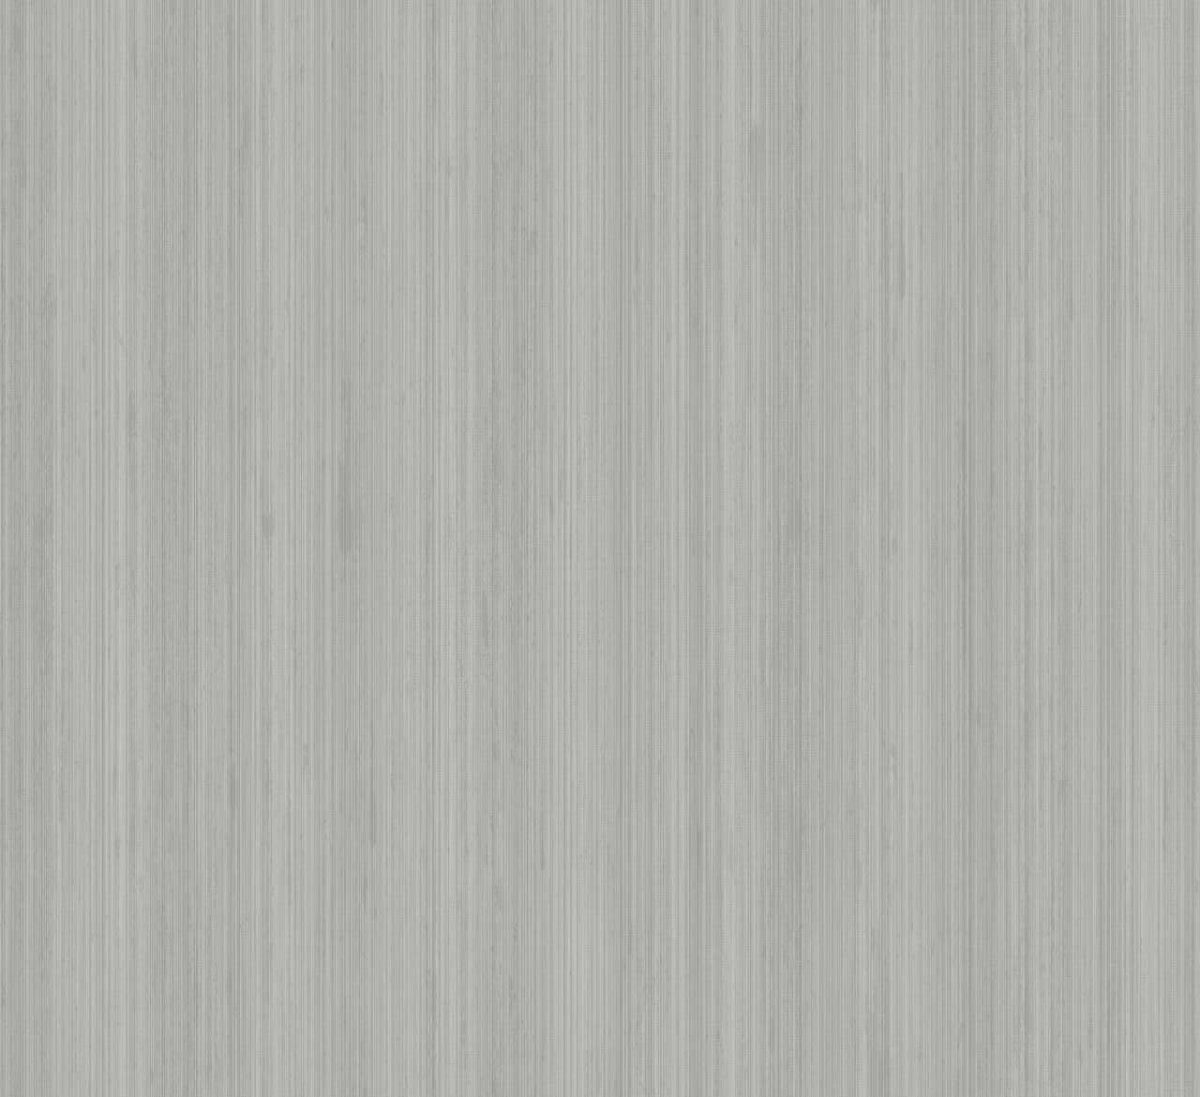 Capri-Luxury-Wallpaper-CP00735-Silk-Texture